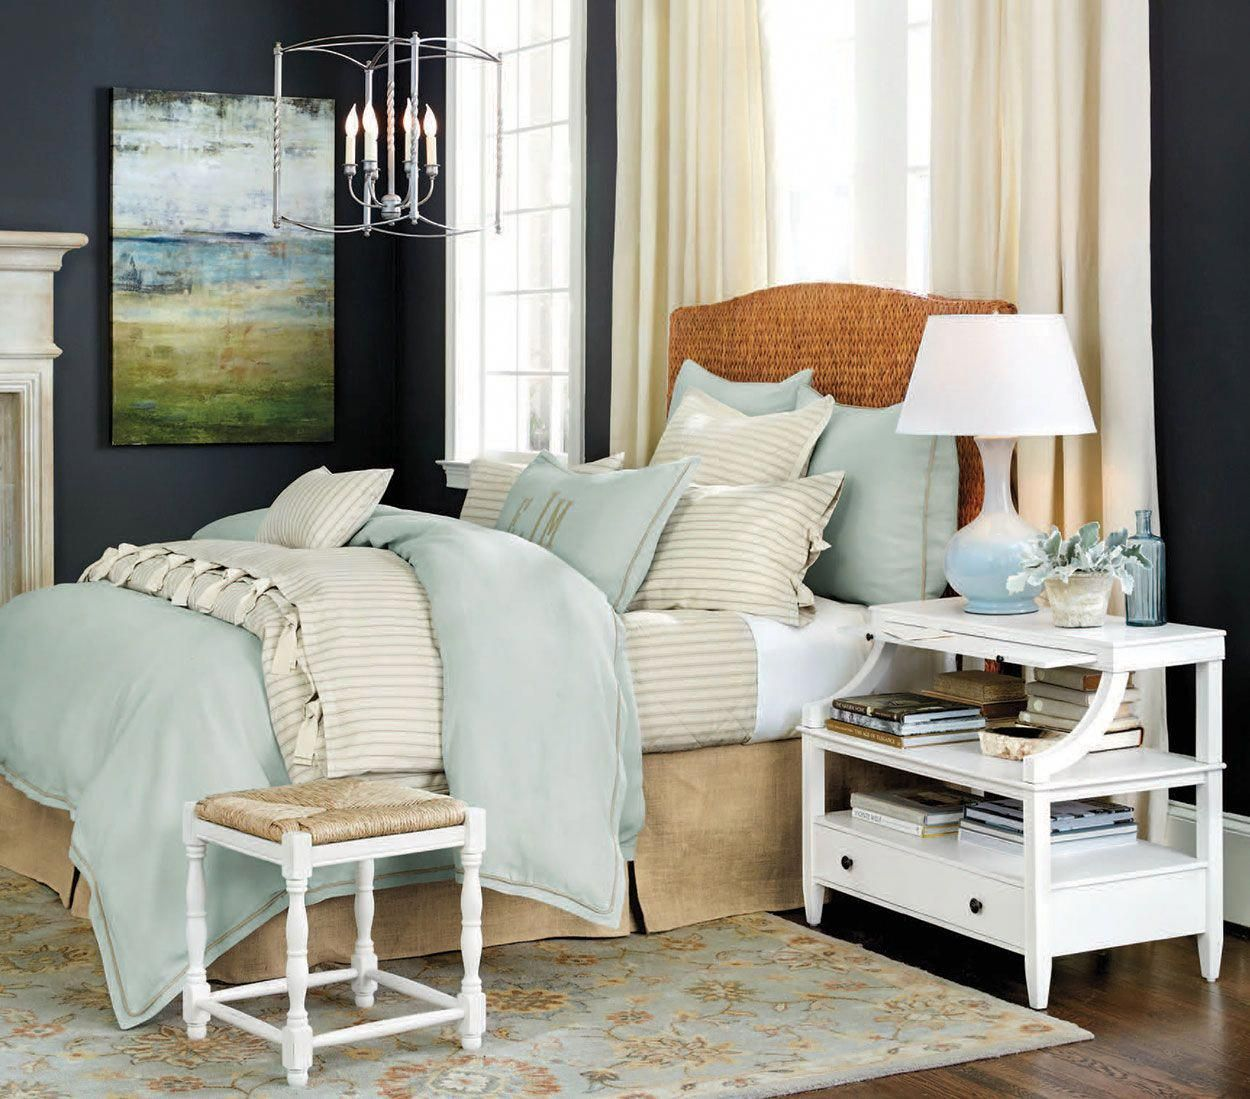 Bed under window  bedrooms  how to decorategallery coastalbedrooms